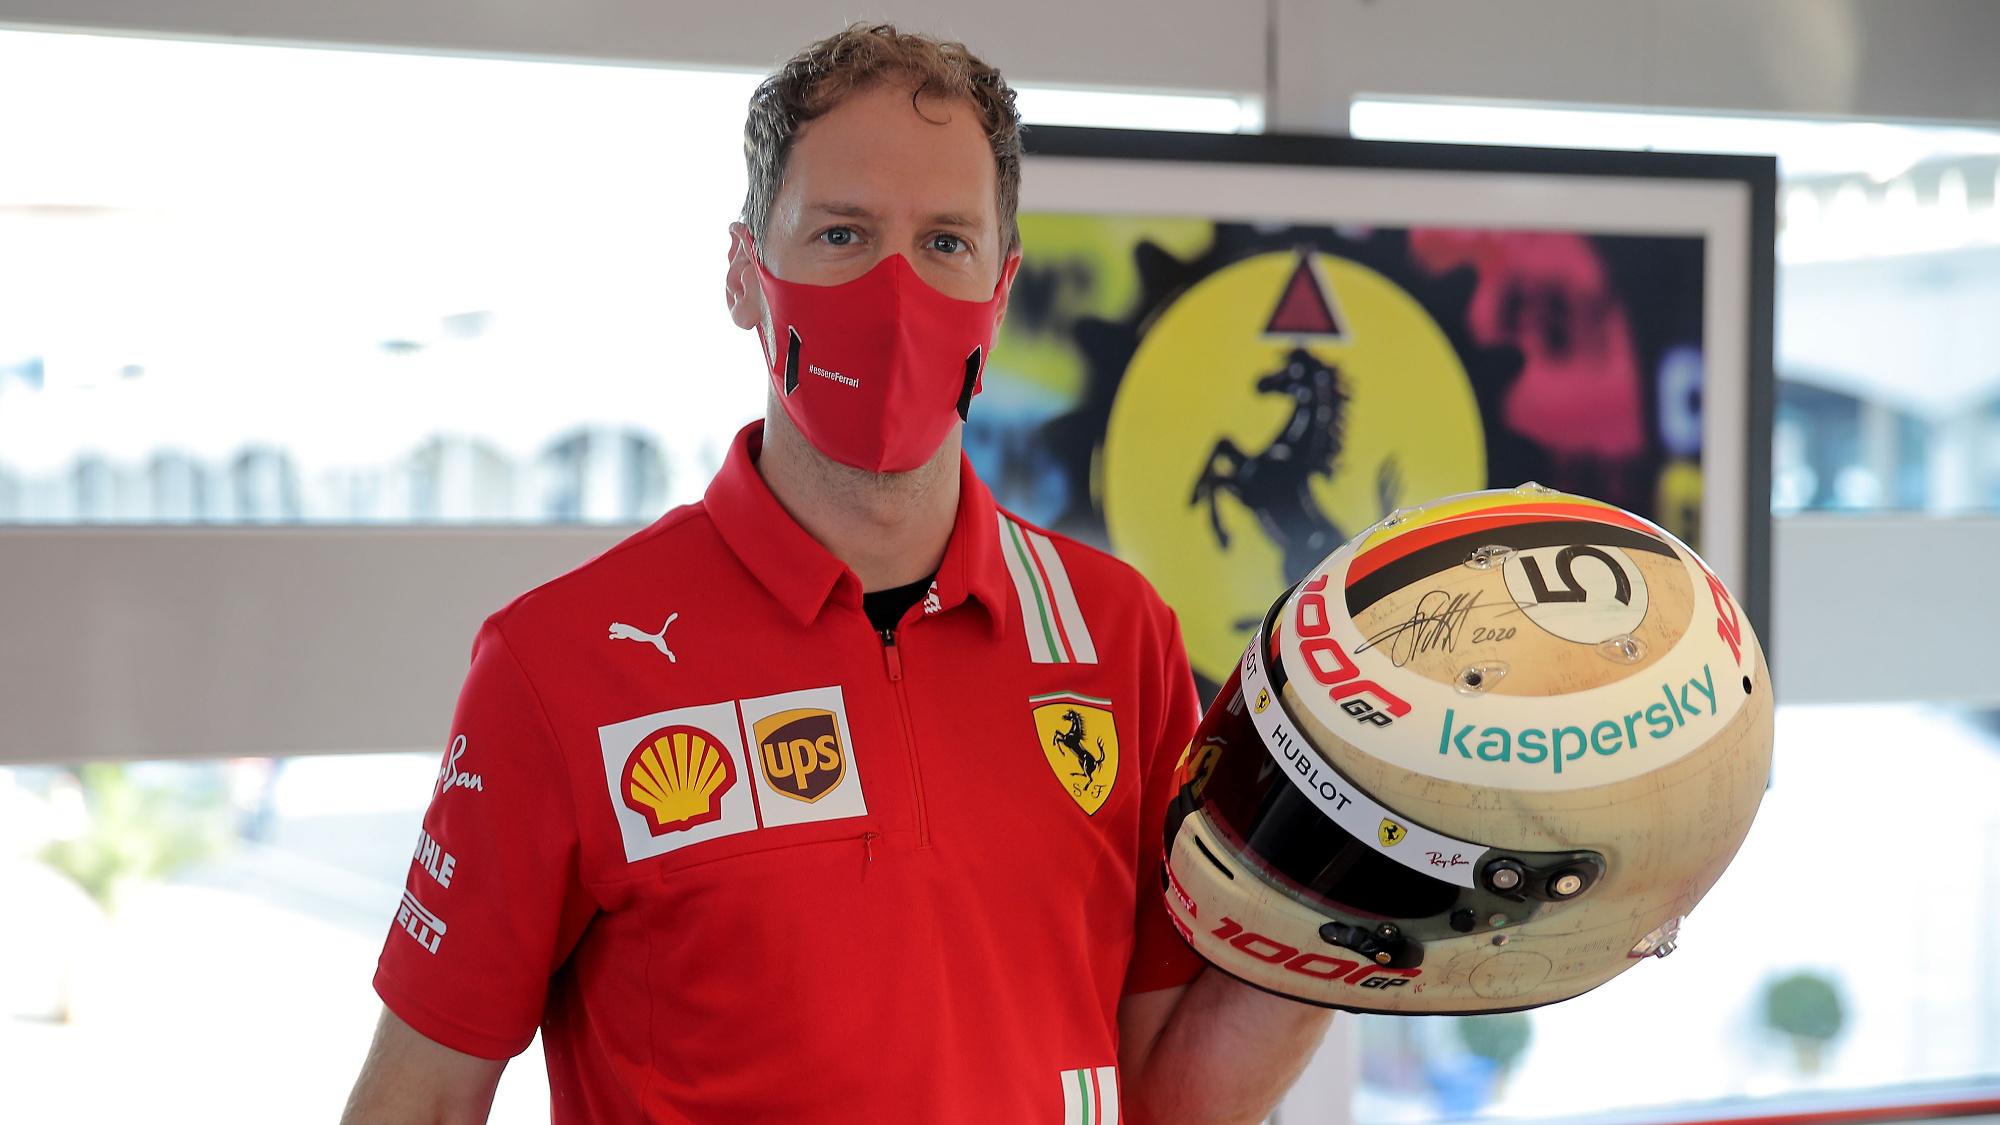 Sebastian Vettel, SF1000